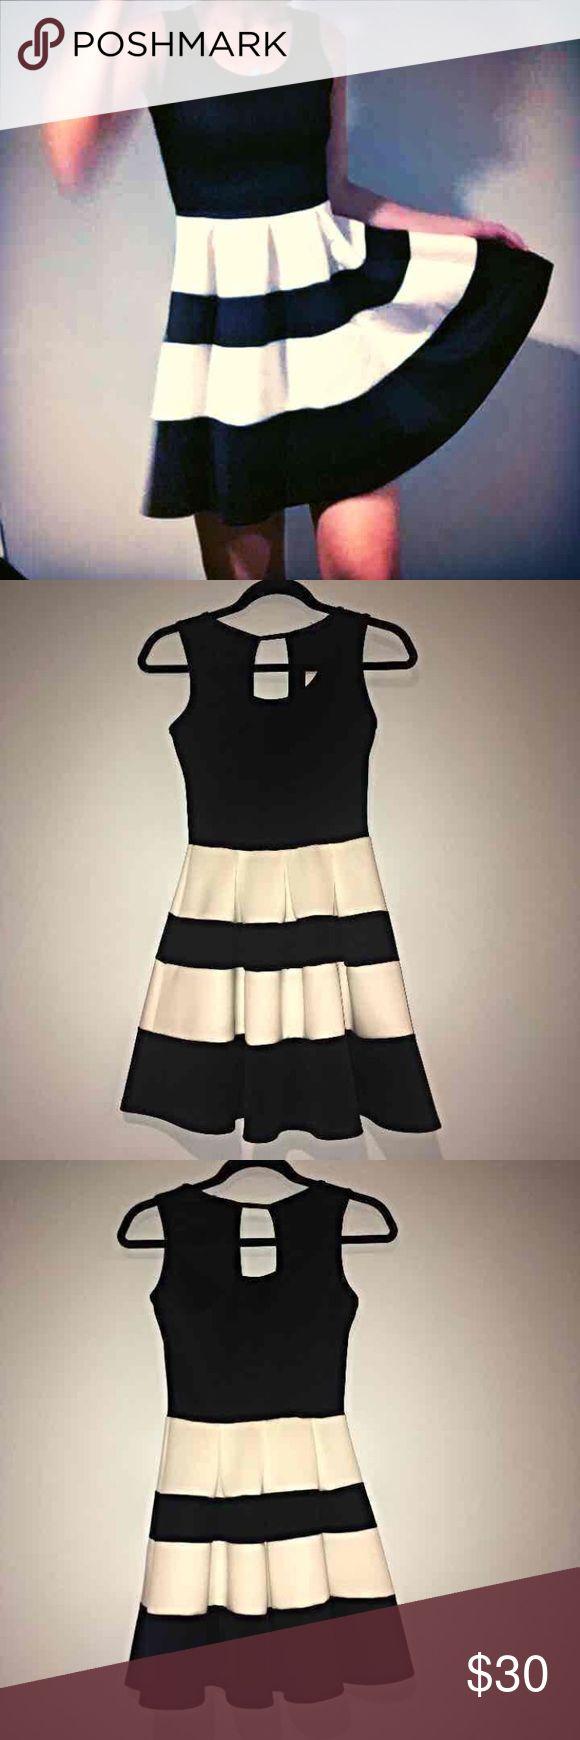 Black and white skater dress Black and white dress by the Vintage Shop.  #skater #style #dress #black and #white #trendy #hipster #vintage vintage shop Dresses